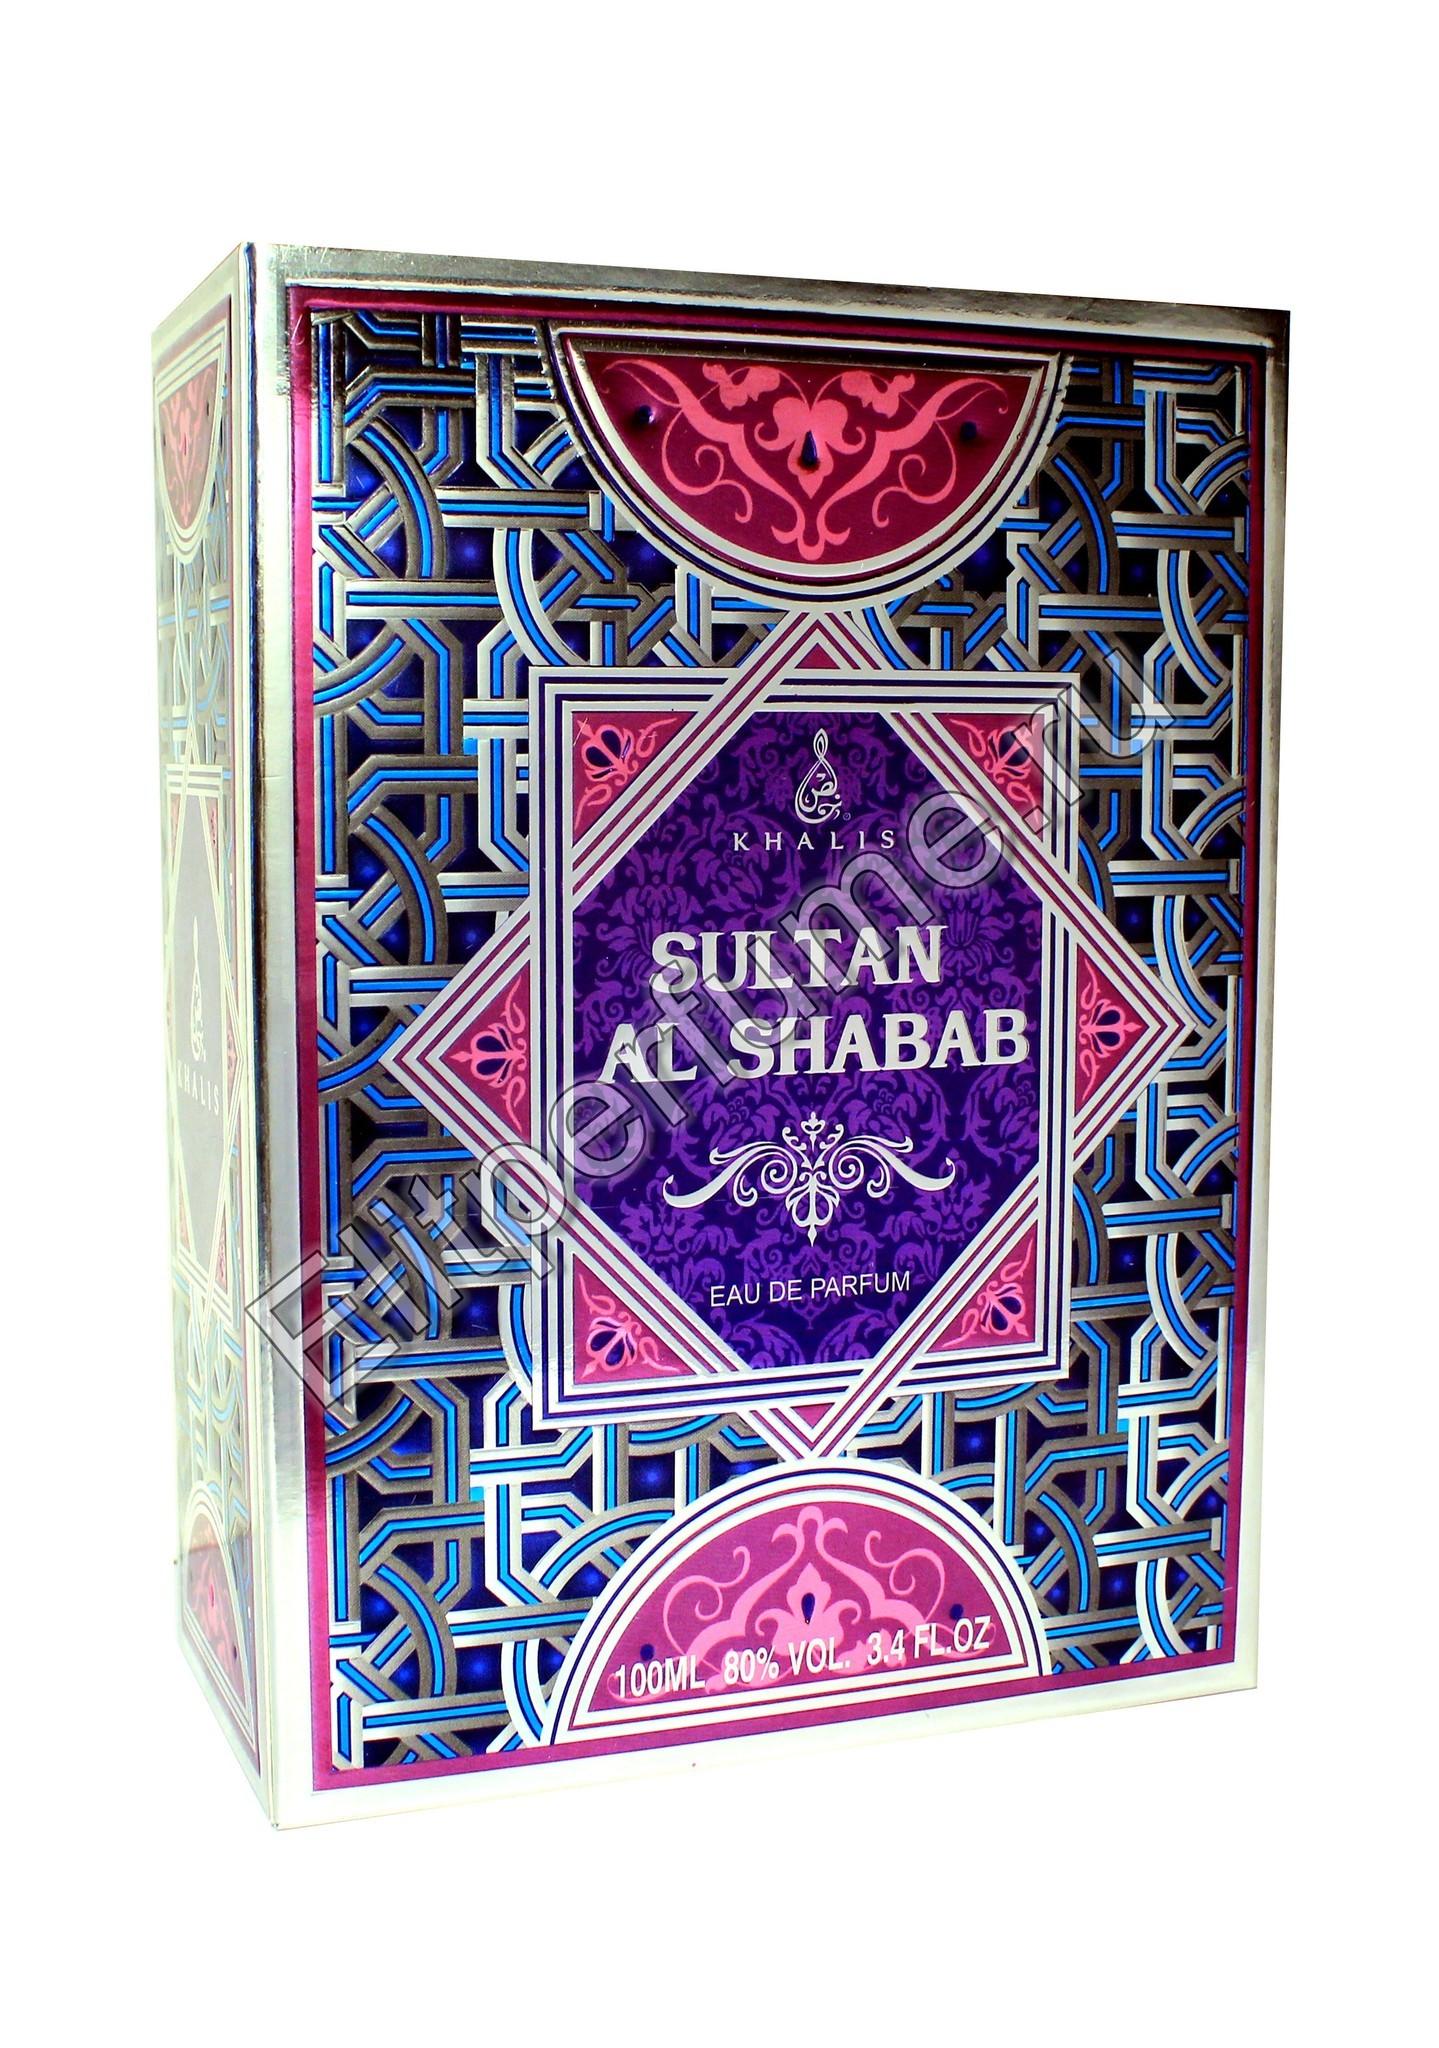 Пробник для Sultant Al Shabab / Султан Аль Шабаб 1 мл спрей от Халис Khalis Perfumes